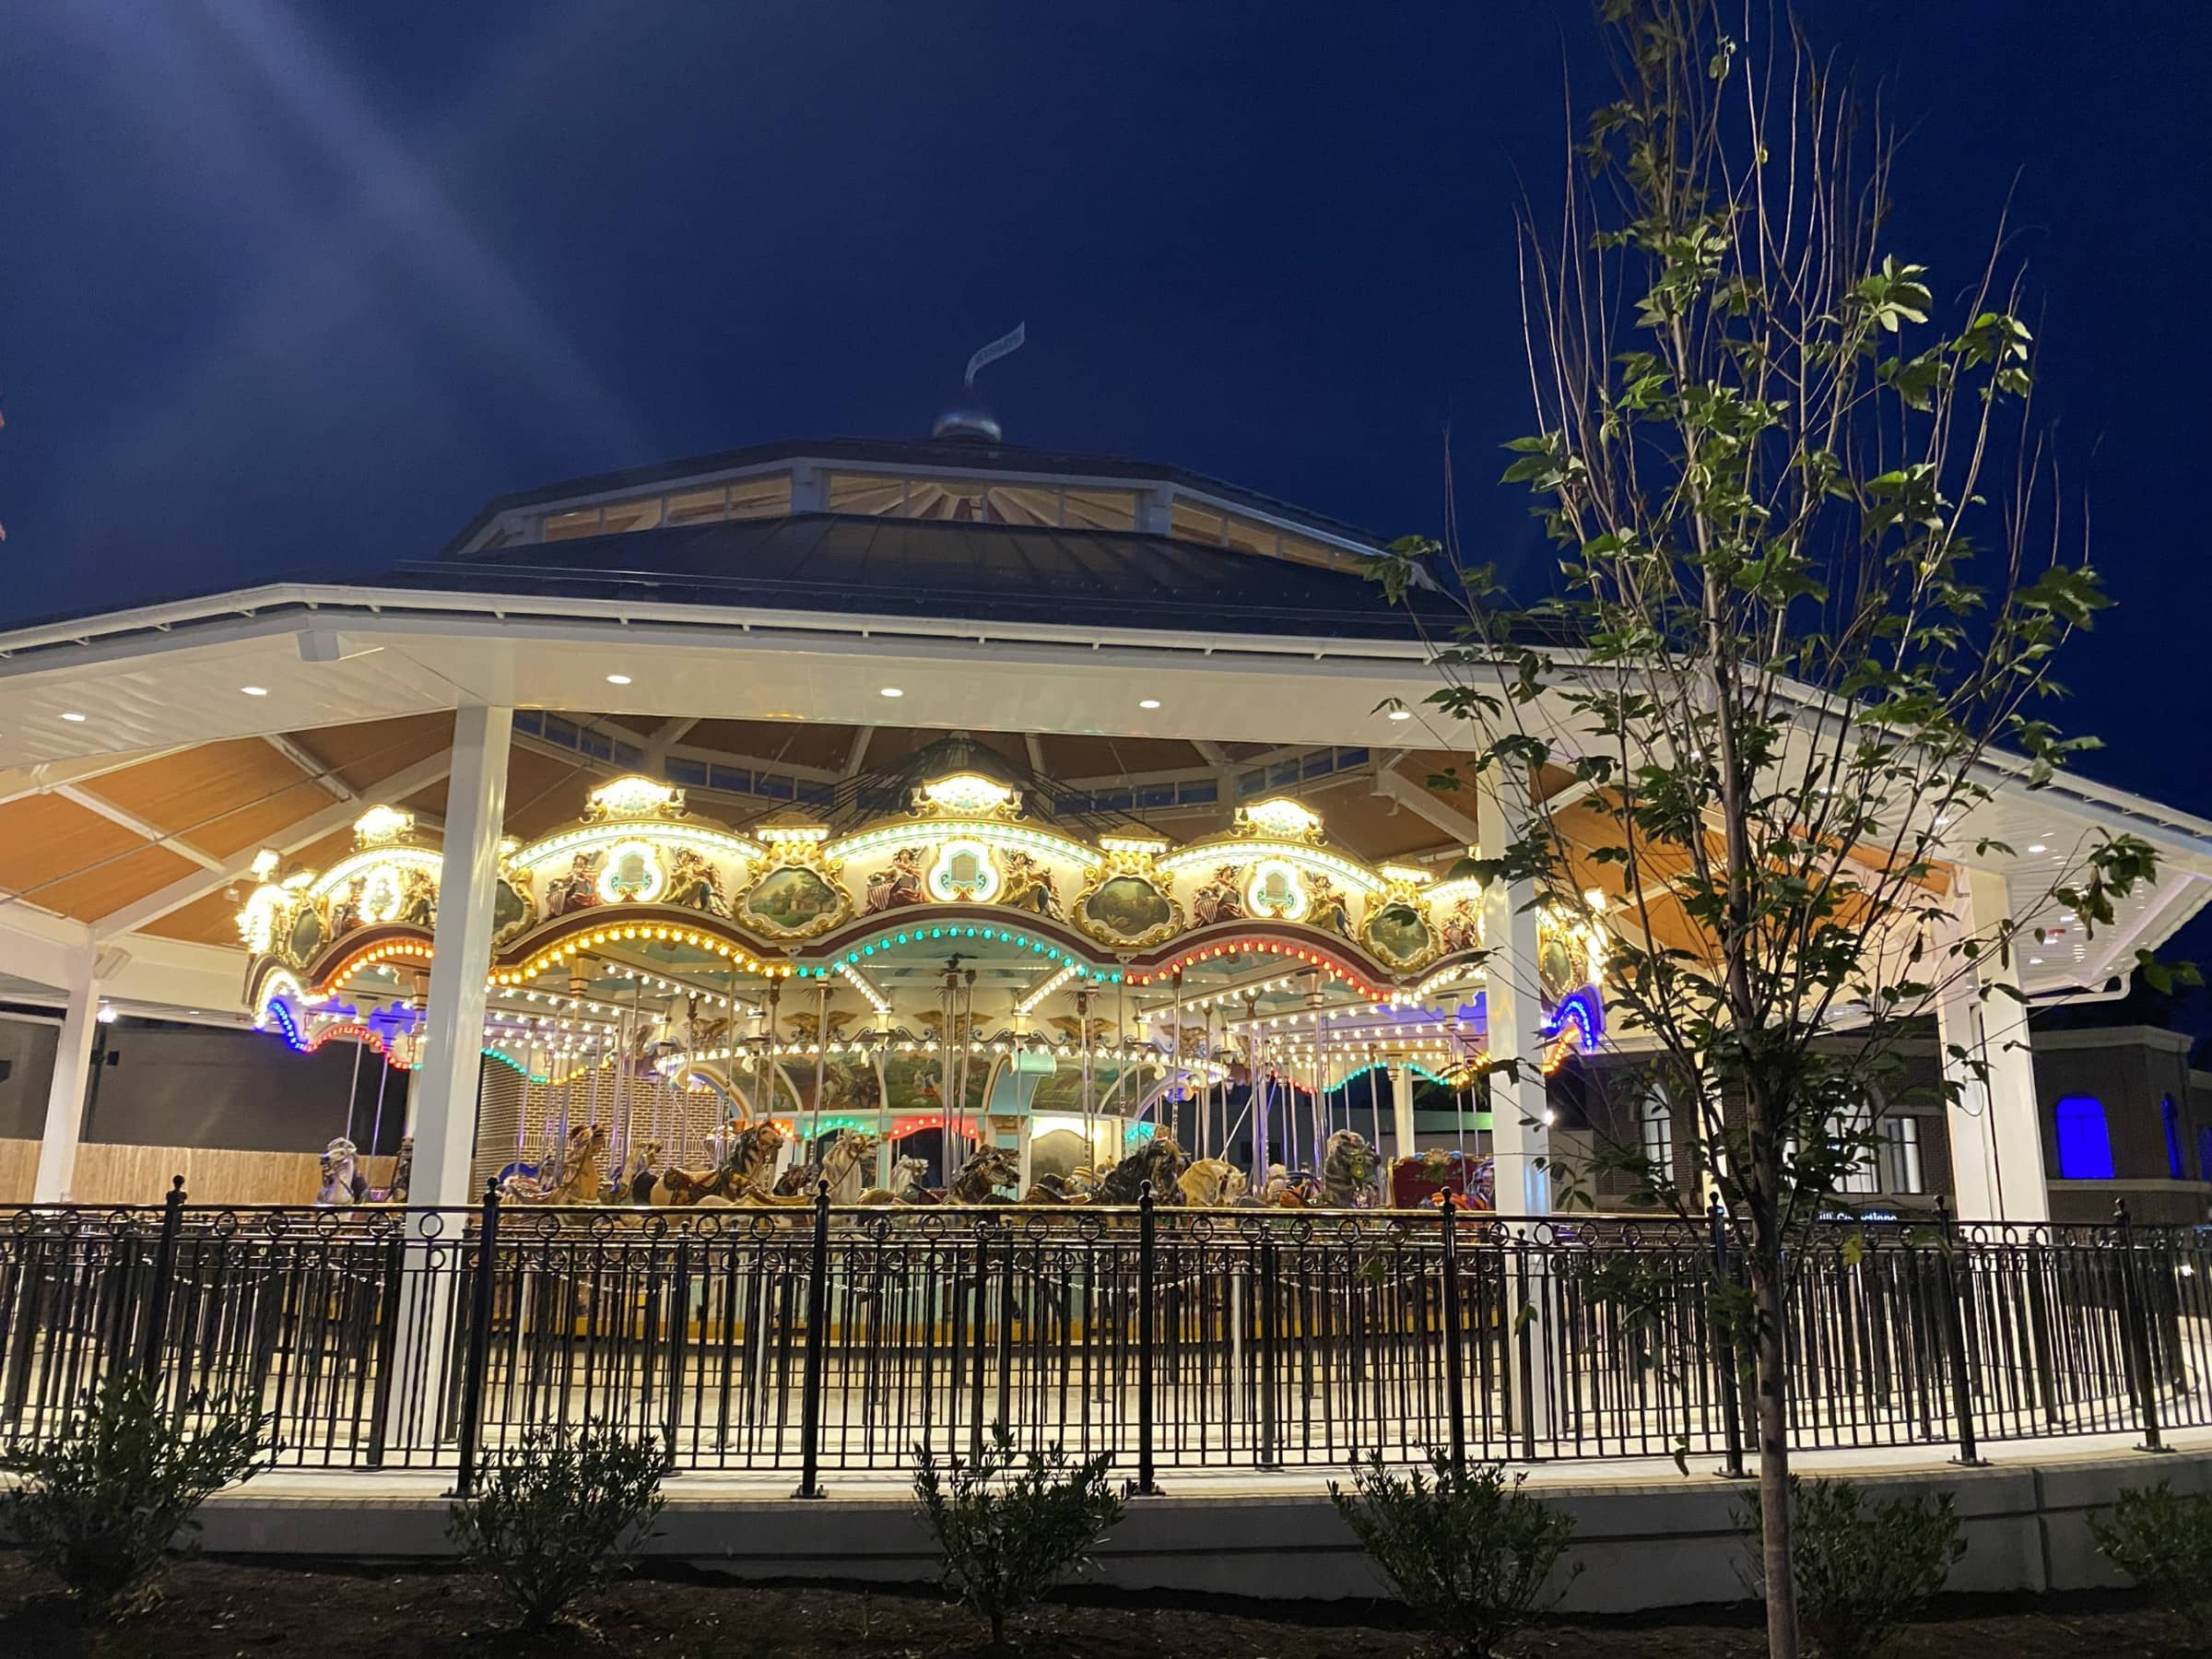 Carrousel at Night